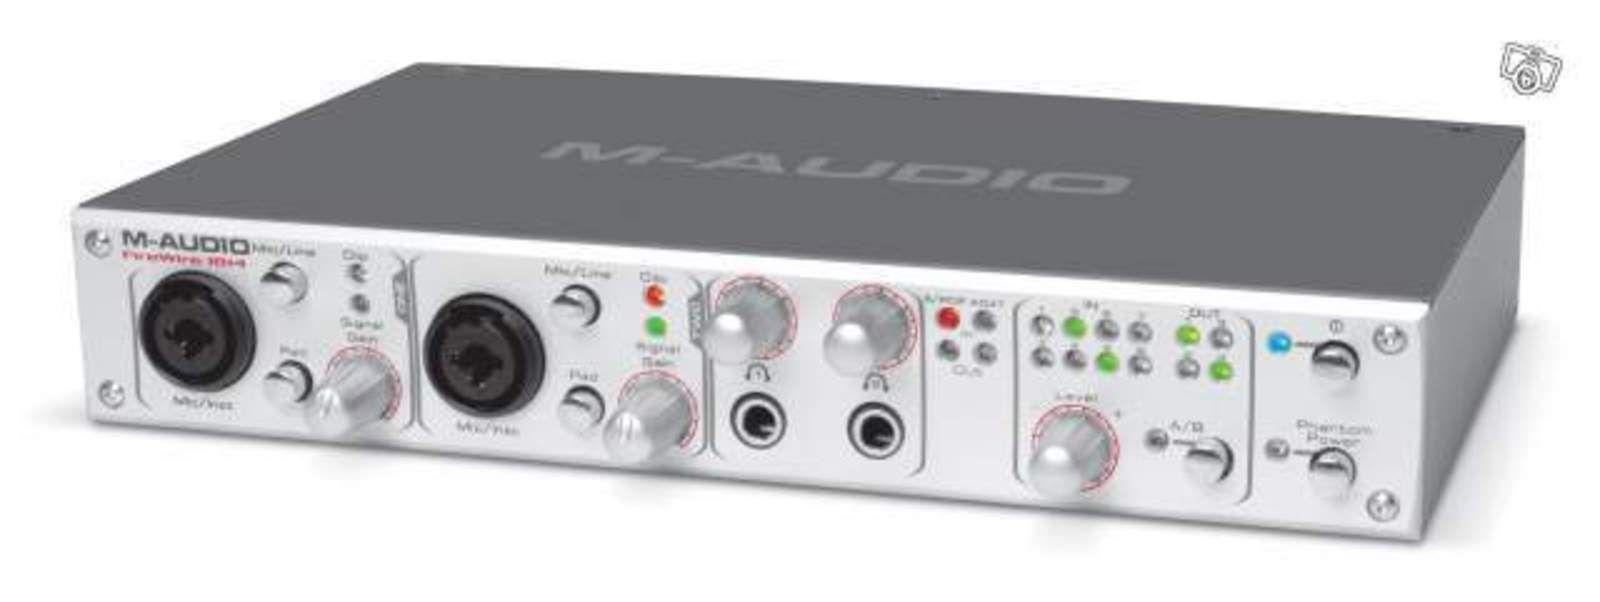 photo m audio firewire 18 14 m audio carte son firewire 1814 42991 audiofanzine